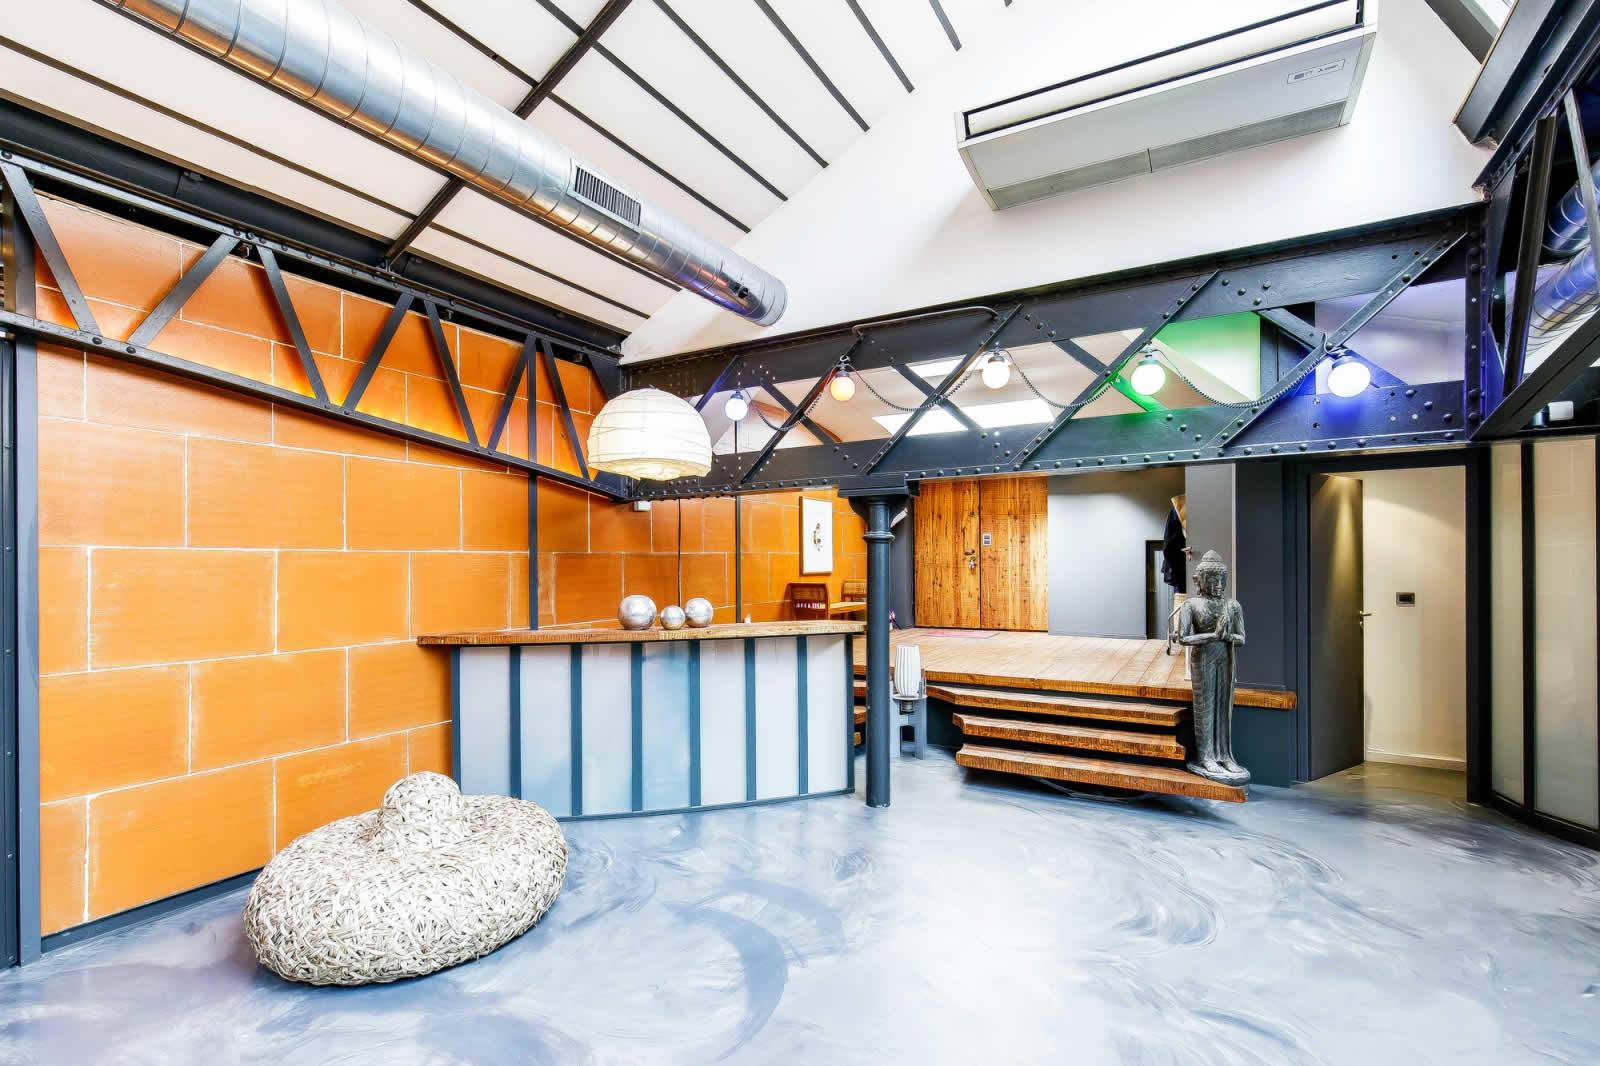 incroyable-loft-a-vendre-quai-du-rhone-renove-patios-caves-garage